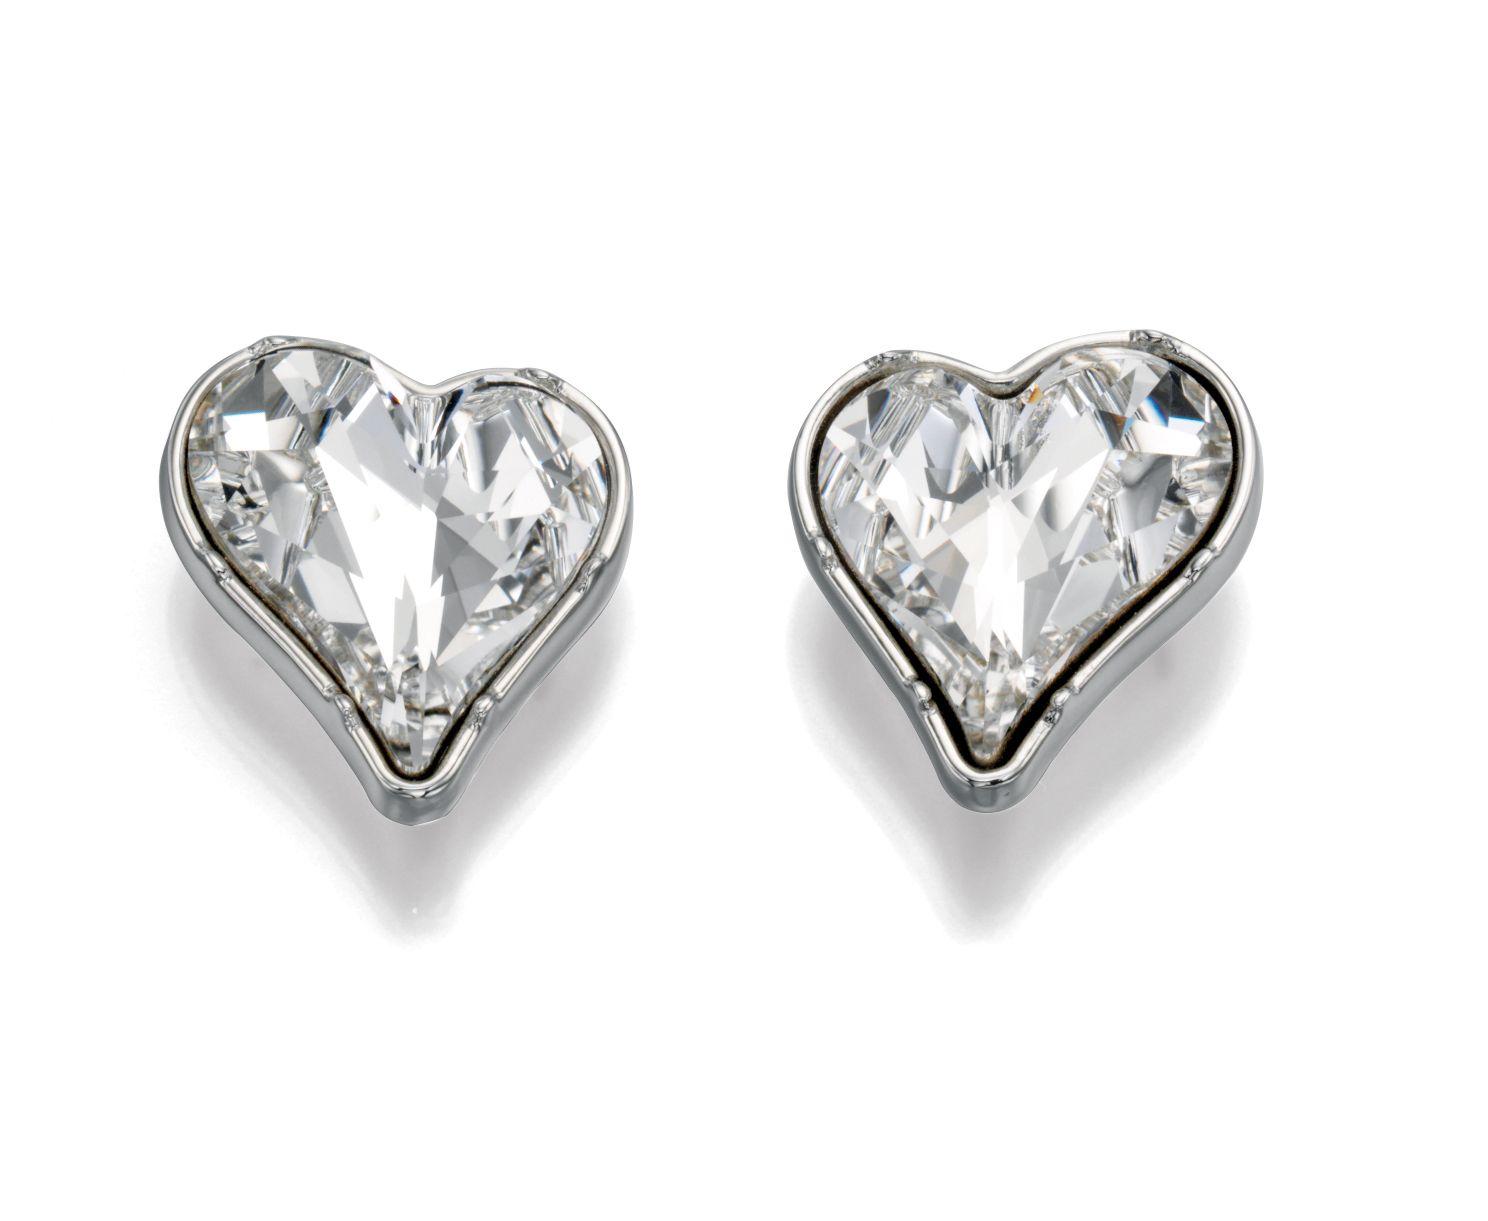 Paradisco - Zali Swarovski Elements Heart Earrings